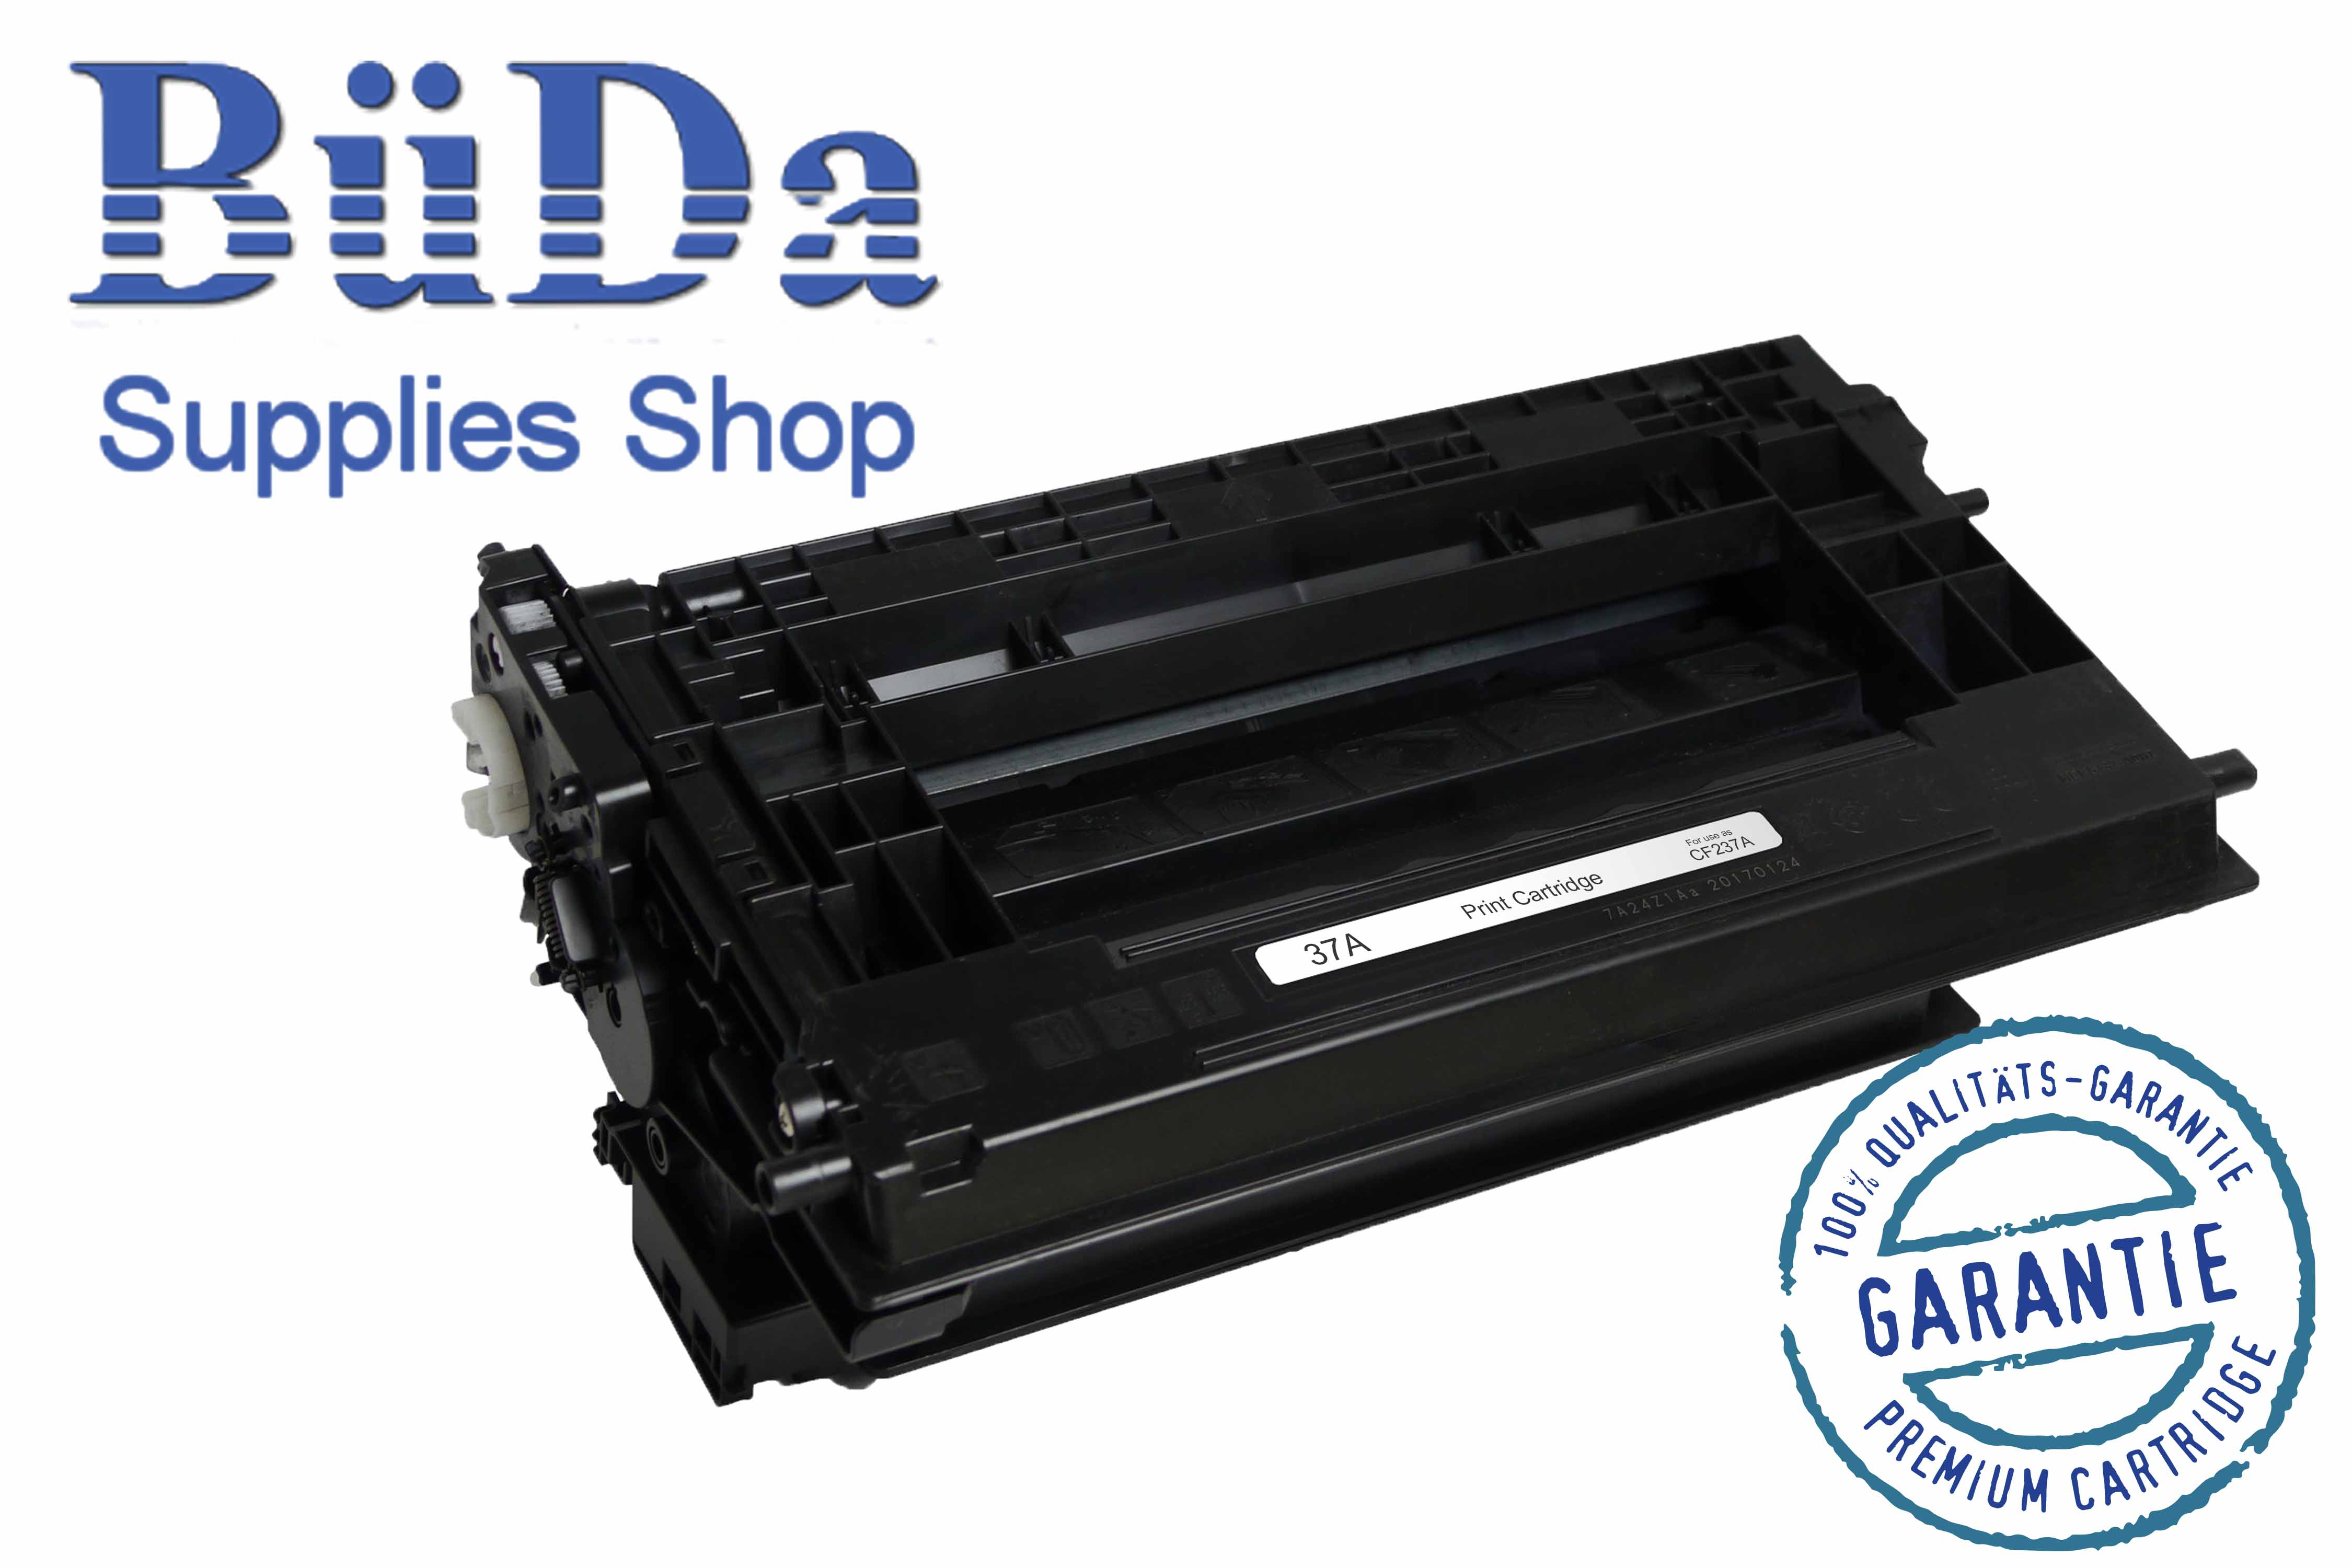 Toner-Modul komp. zu CF237A black 11000 Seiten